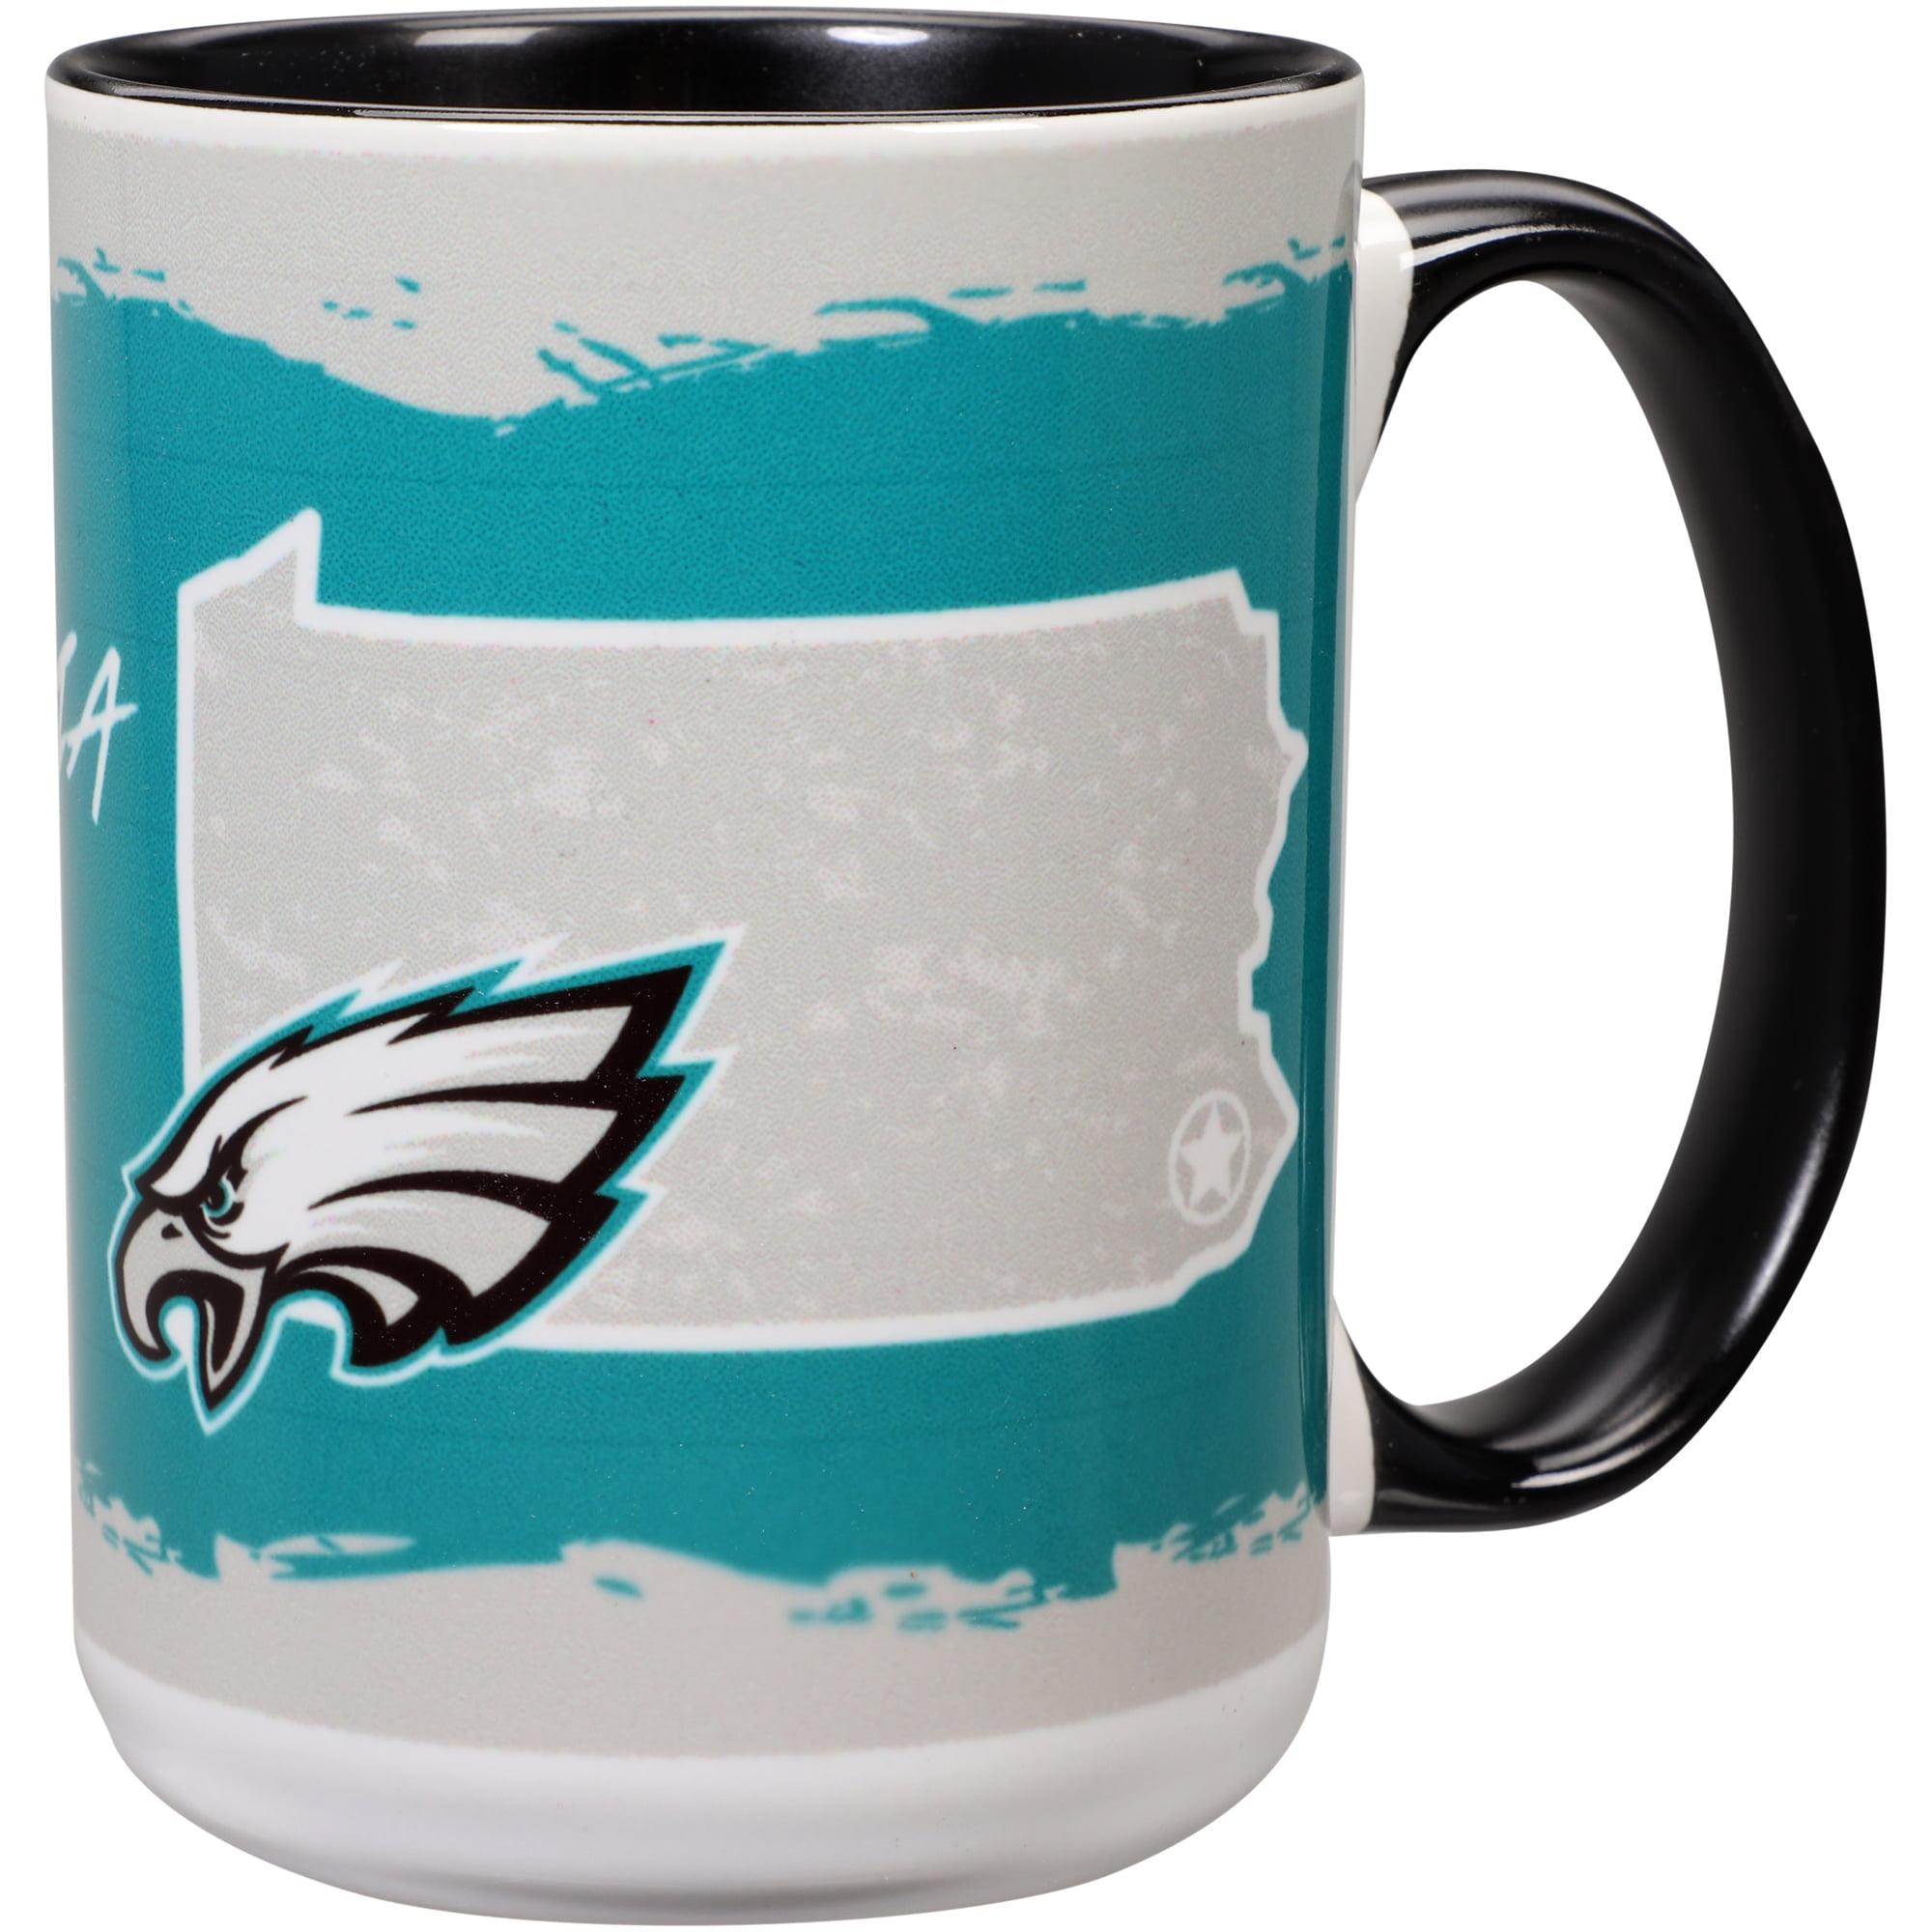 Philadelphia Eagles 15oz. It's Your State Of Mind Mug - No Size